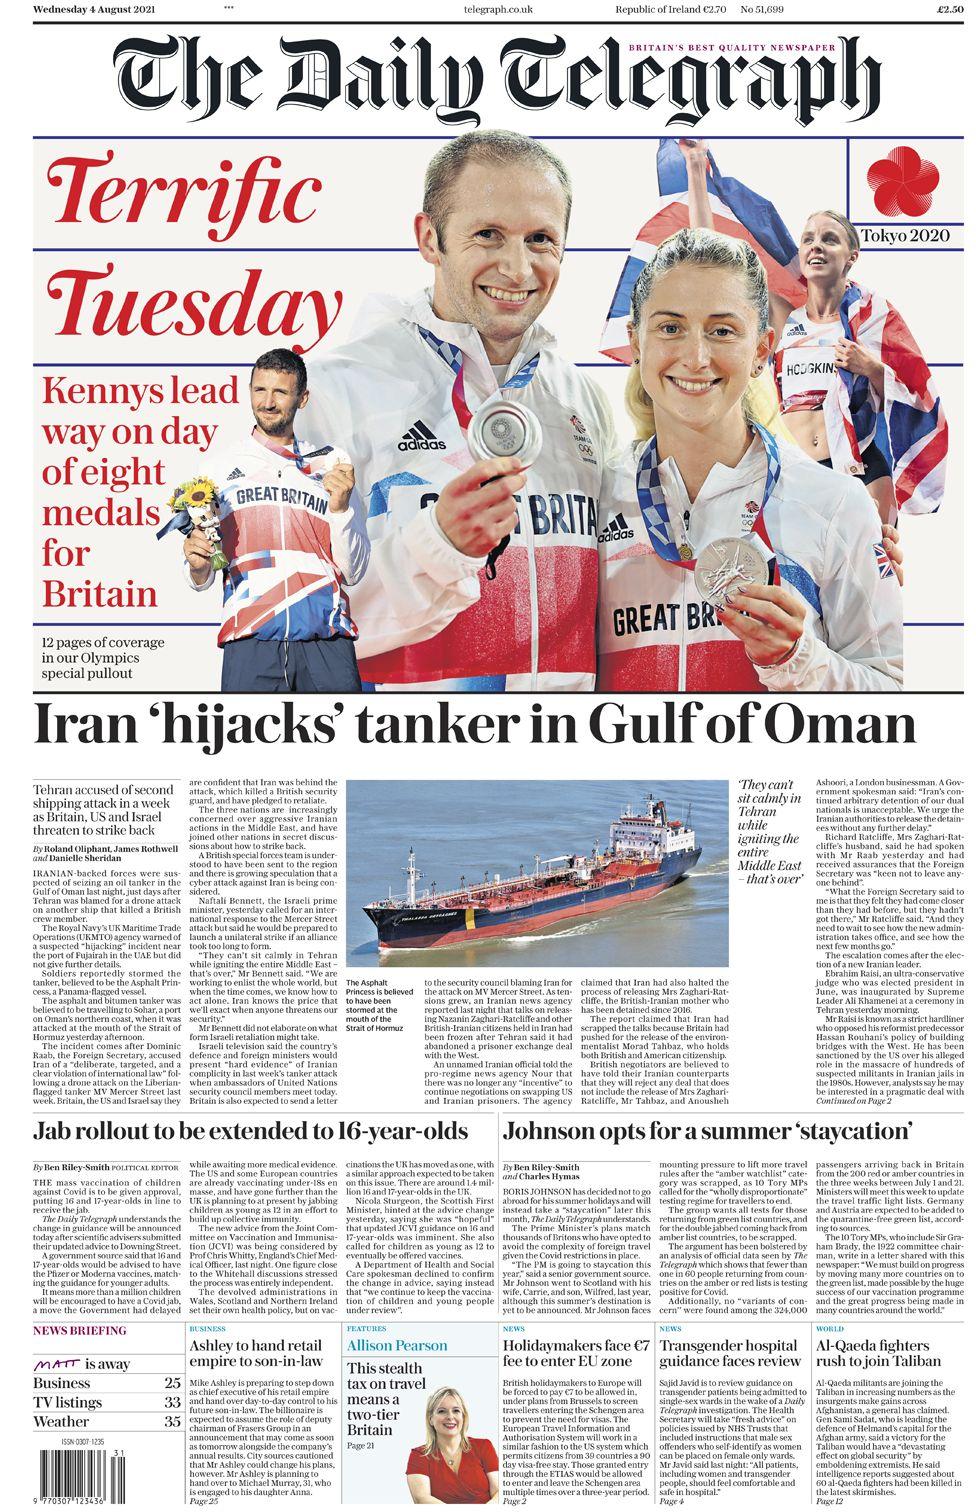 Daily Telegraph - 04/08/21